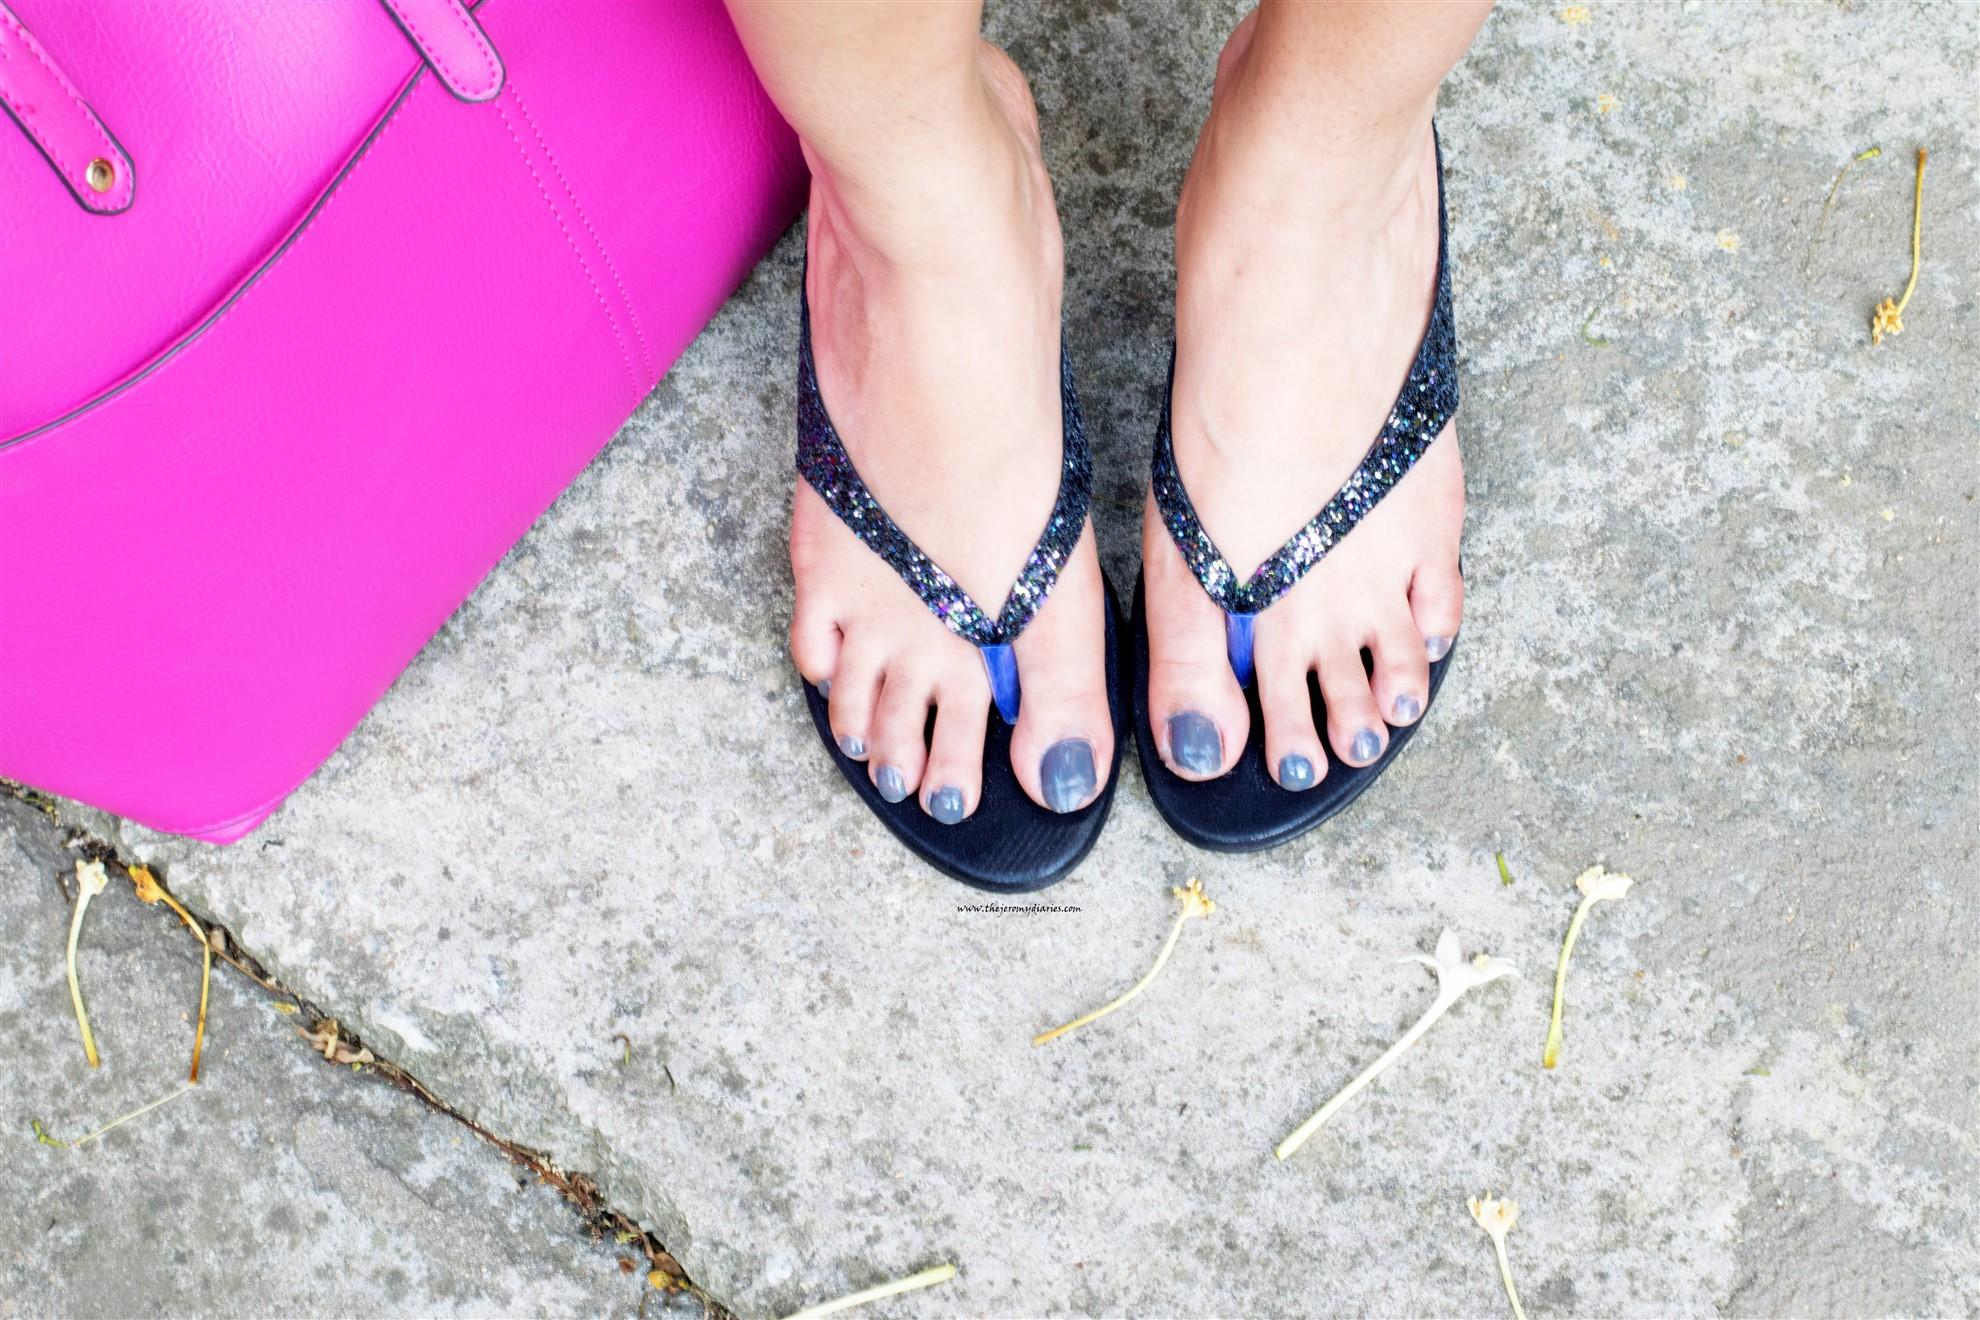 sequinned-kitten-heels-reliance-footprint-x-the-jeromy-diaries